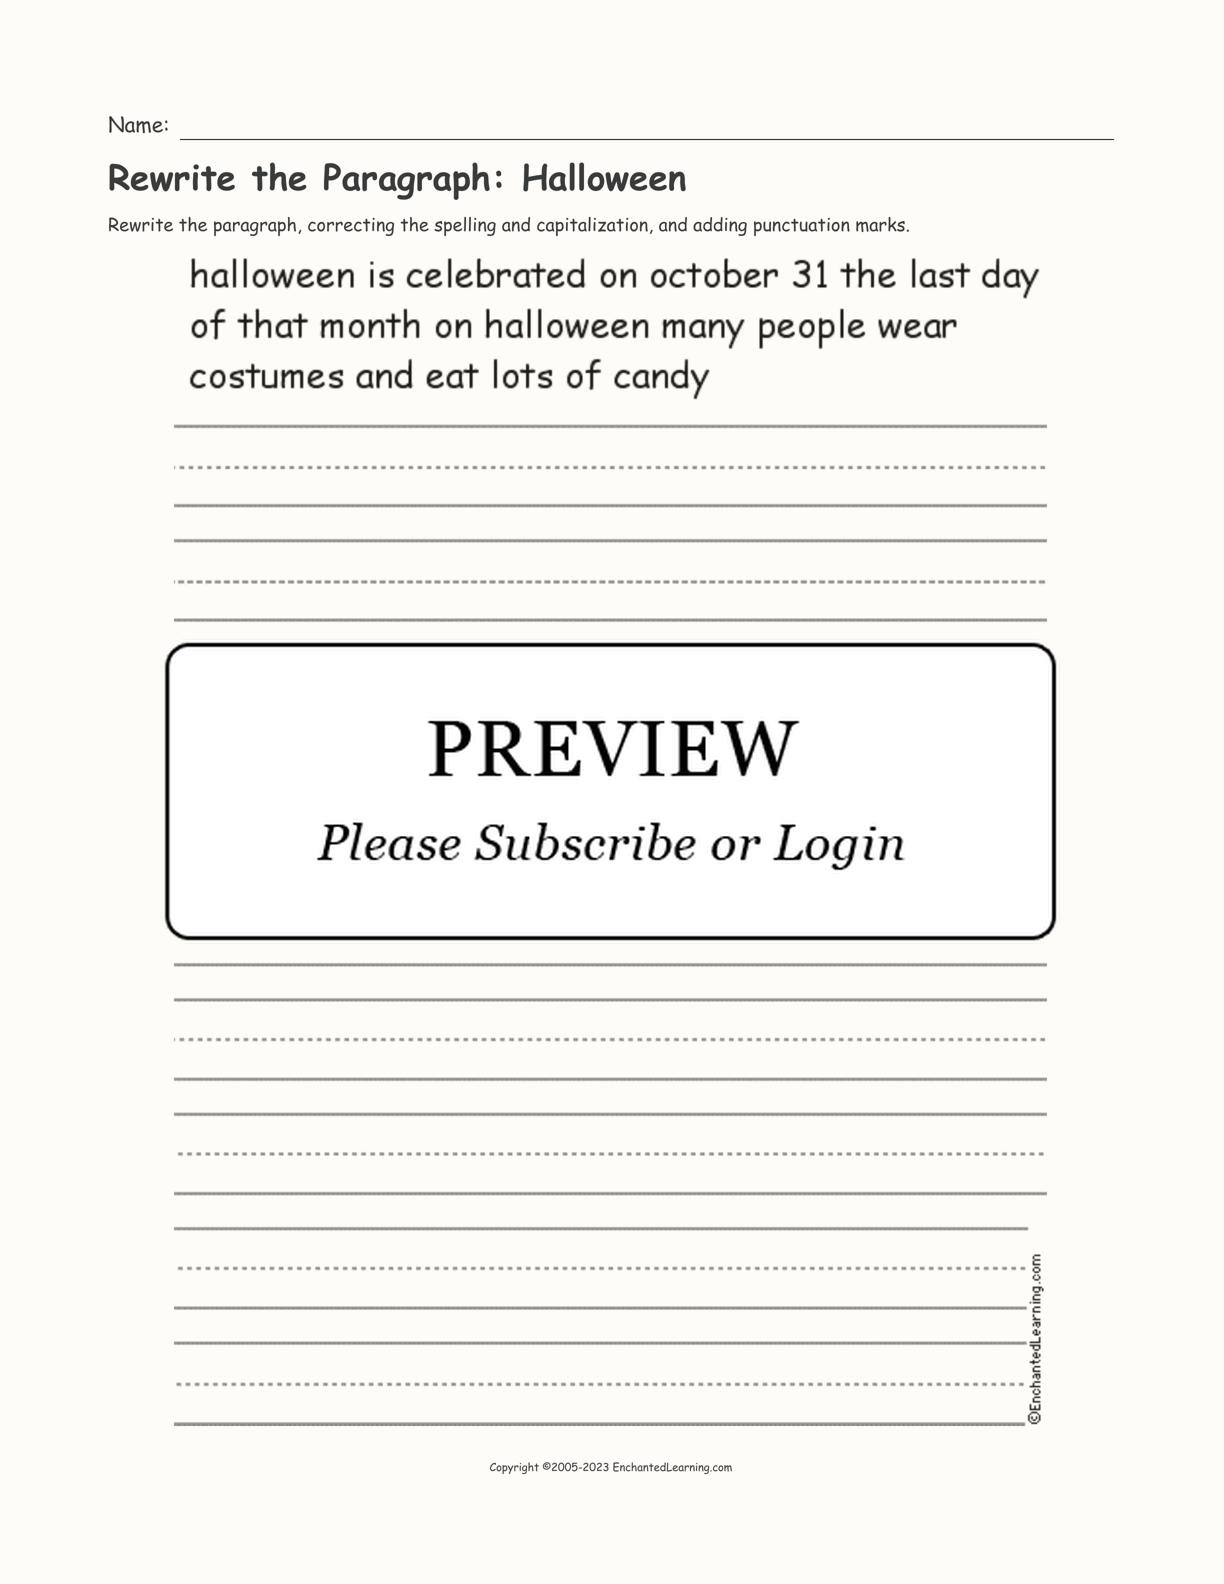 Rewrite The Paragraph Halloween Printout